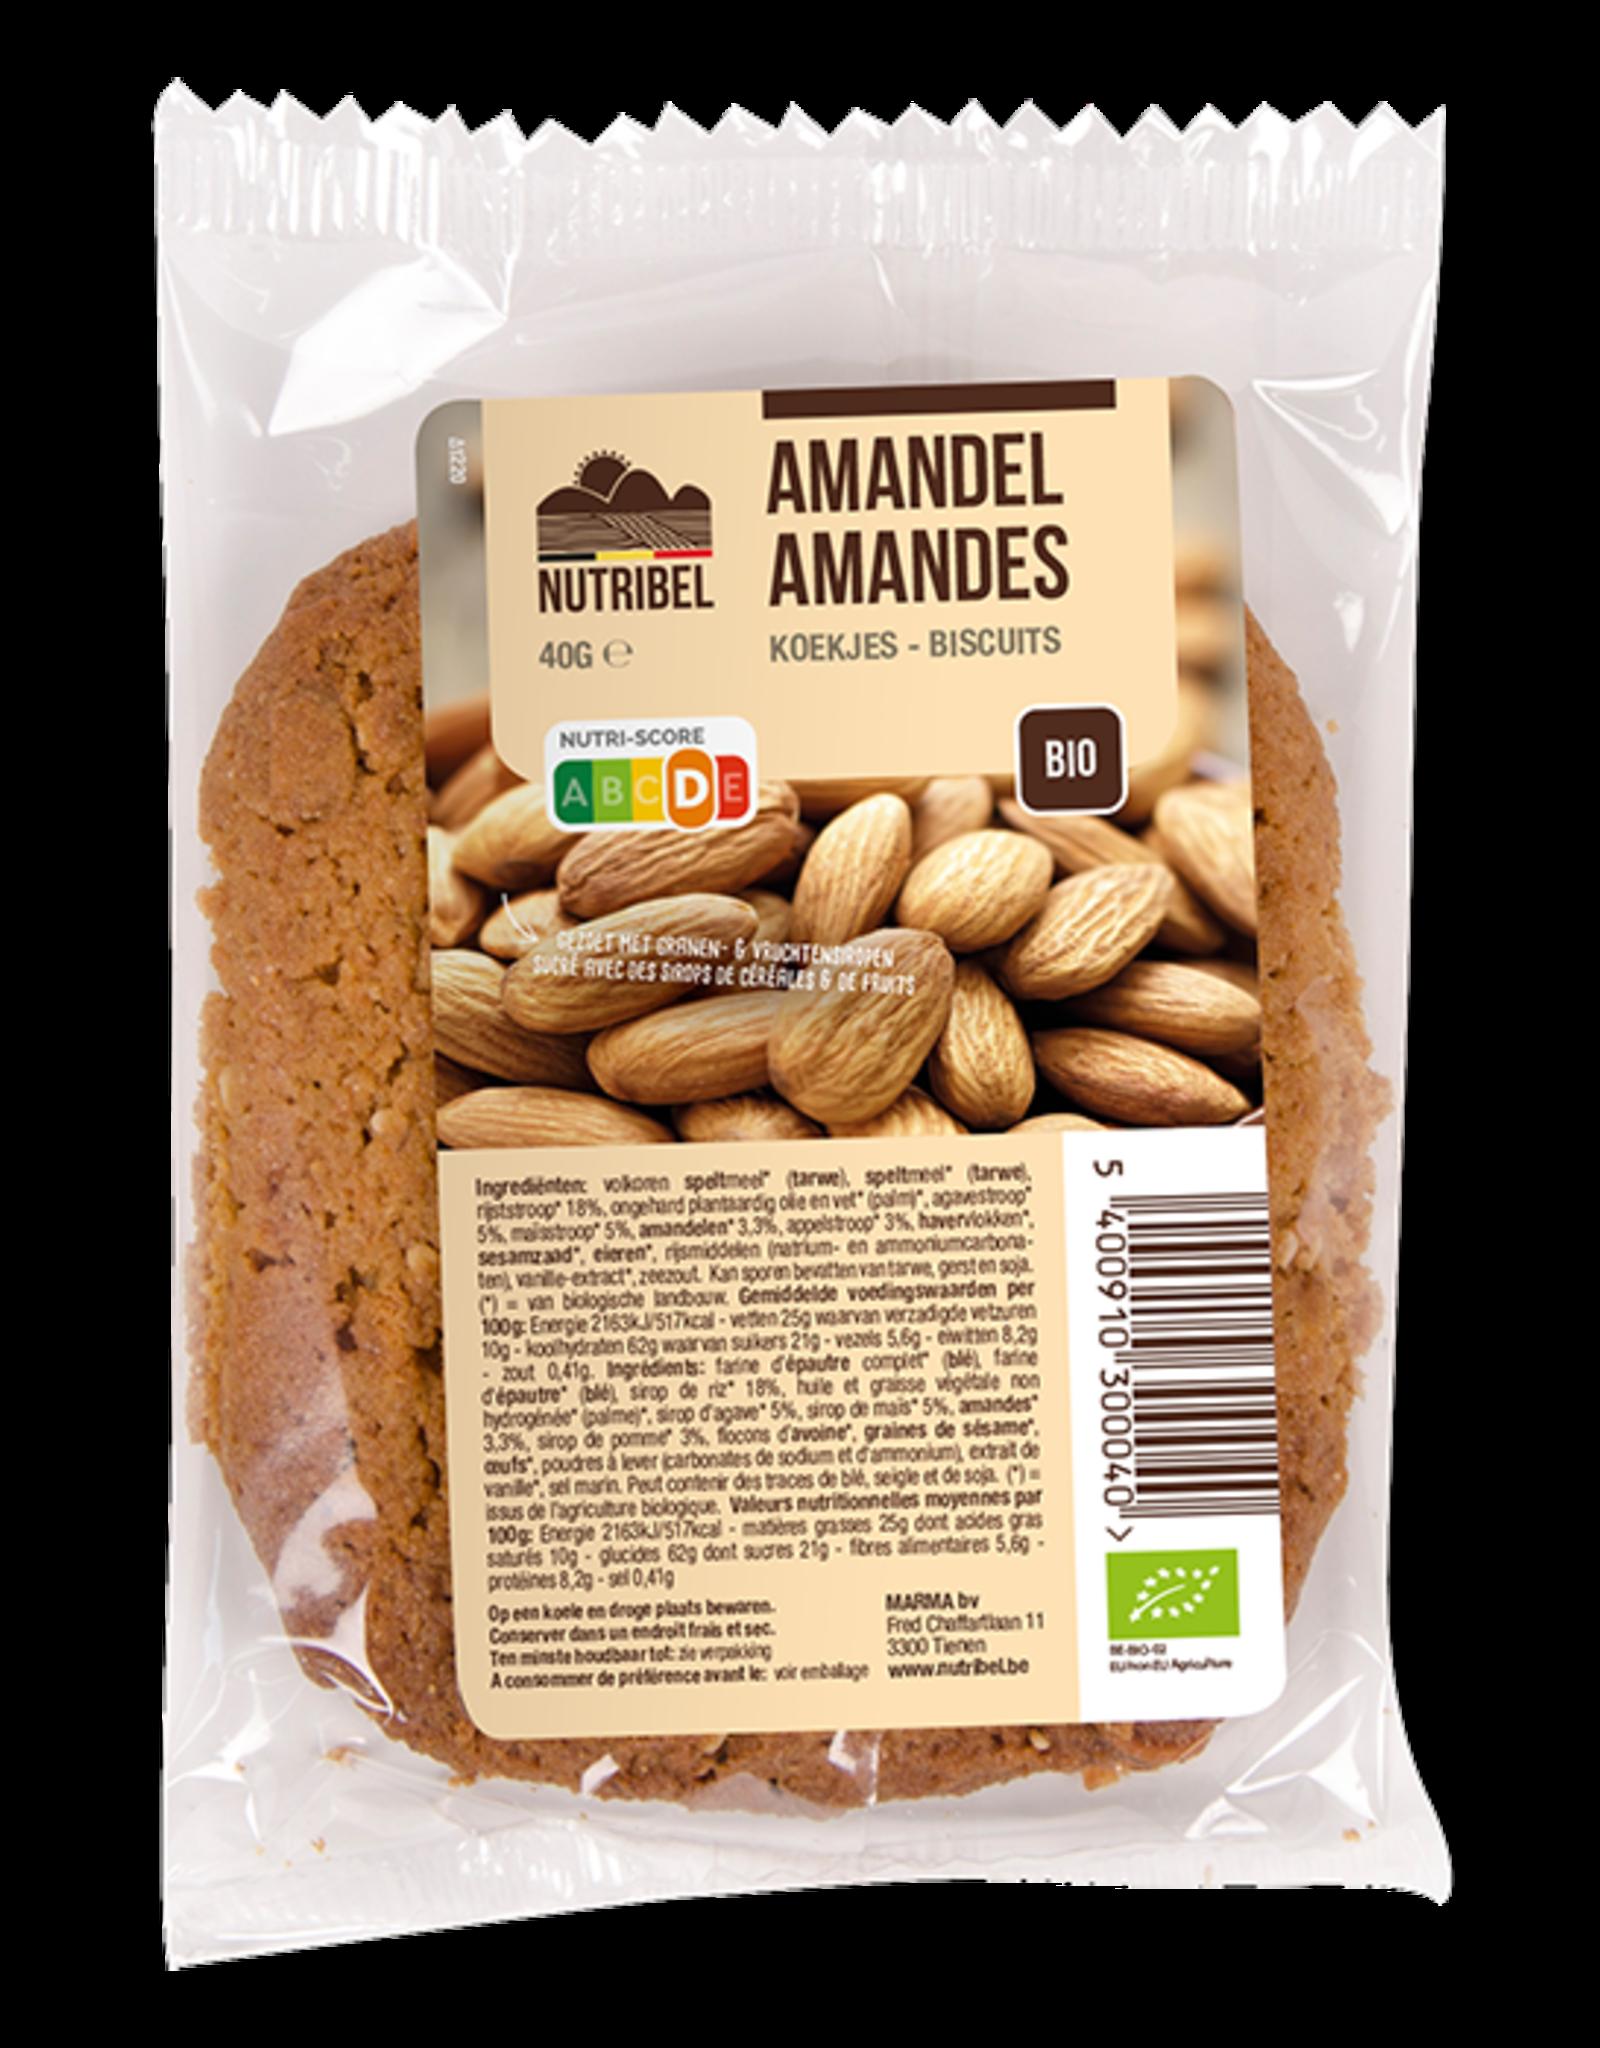 Nutribel Biscuit épeautre amande bio 40g 20 pièces